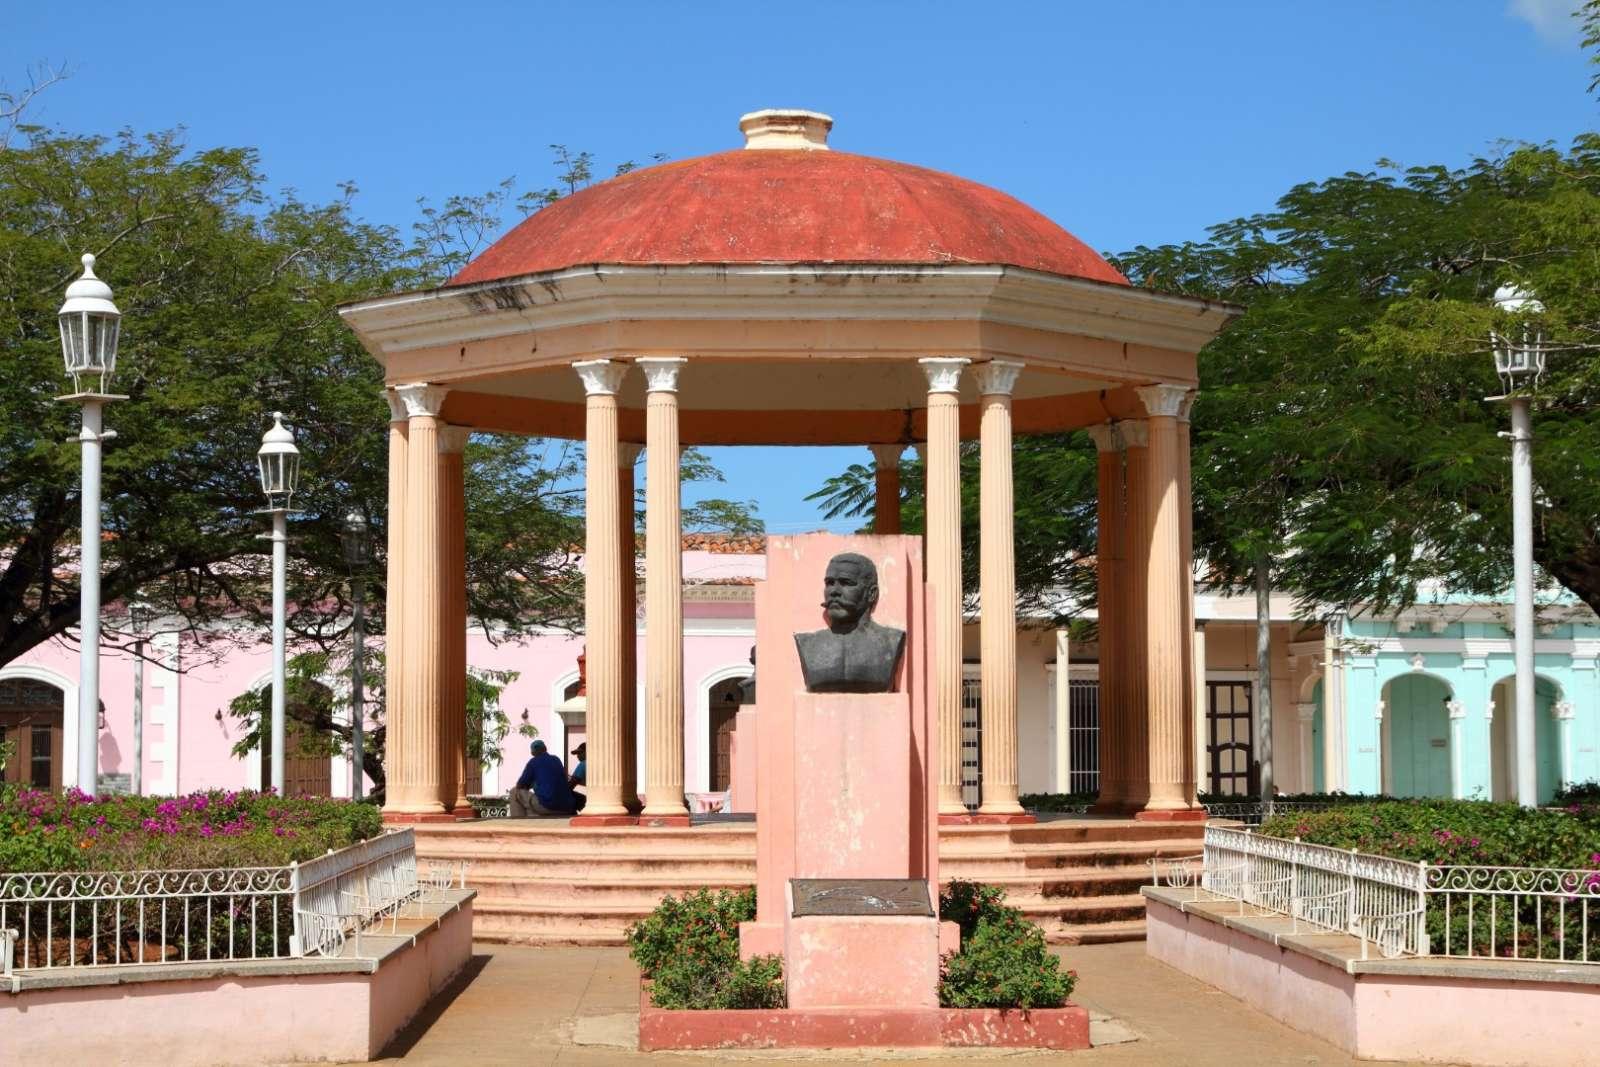 Bandstand in Remedios, Cuba